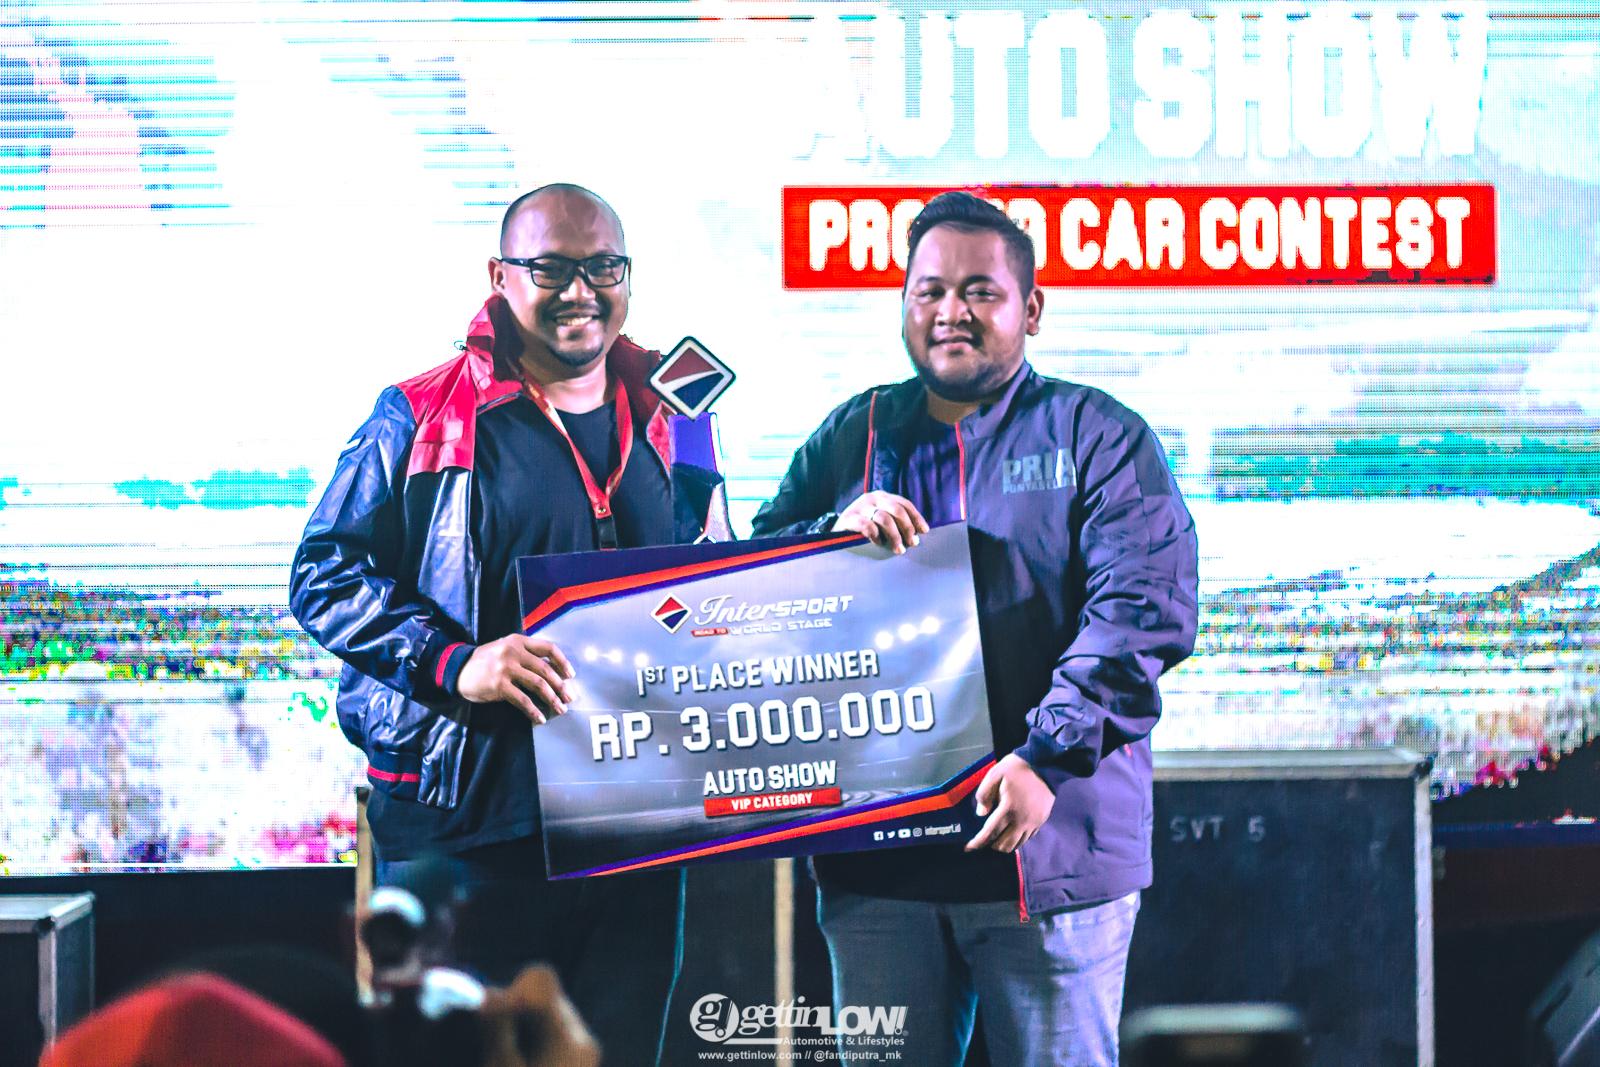 intersport autoshow proper car contest 2018 Bekasi